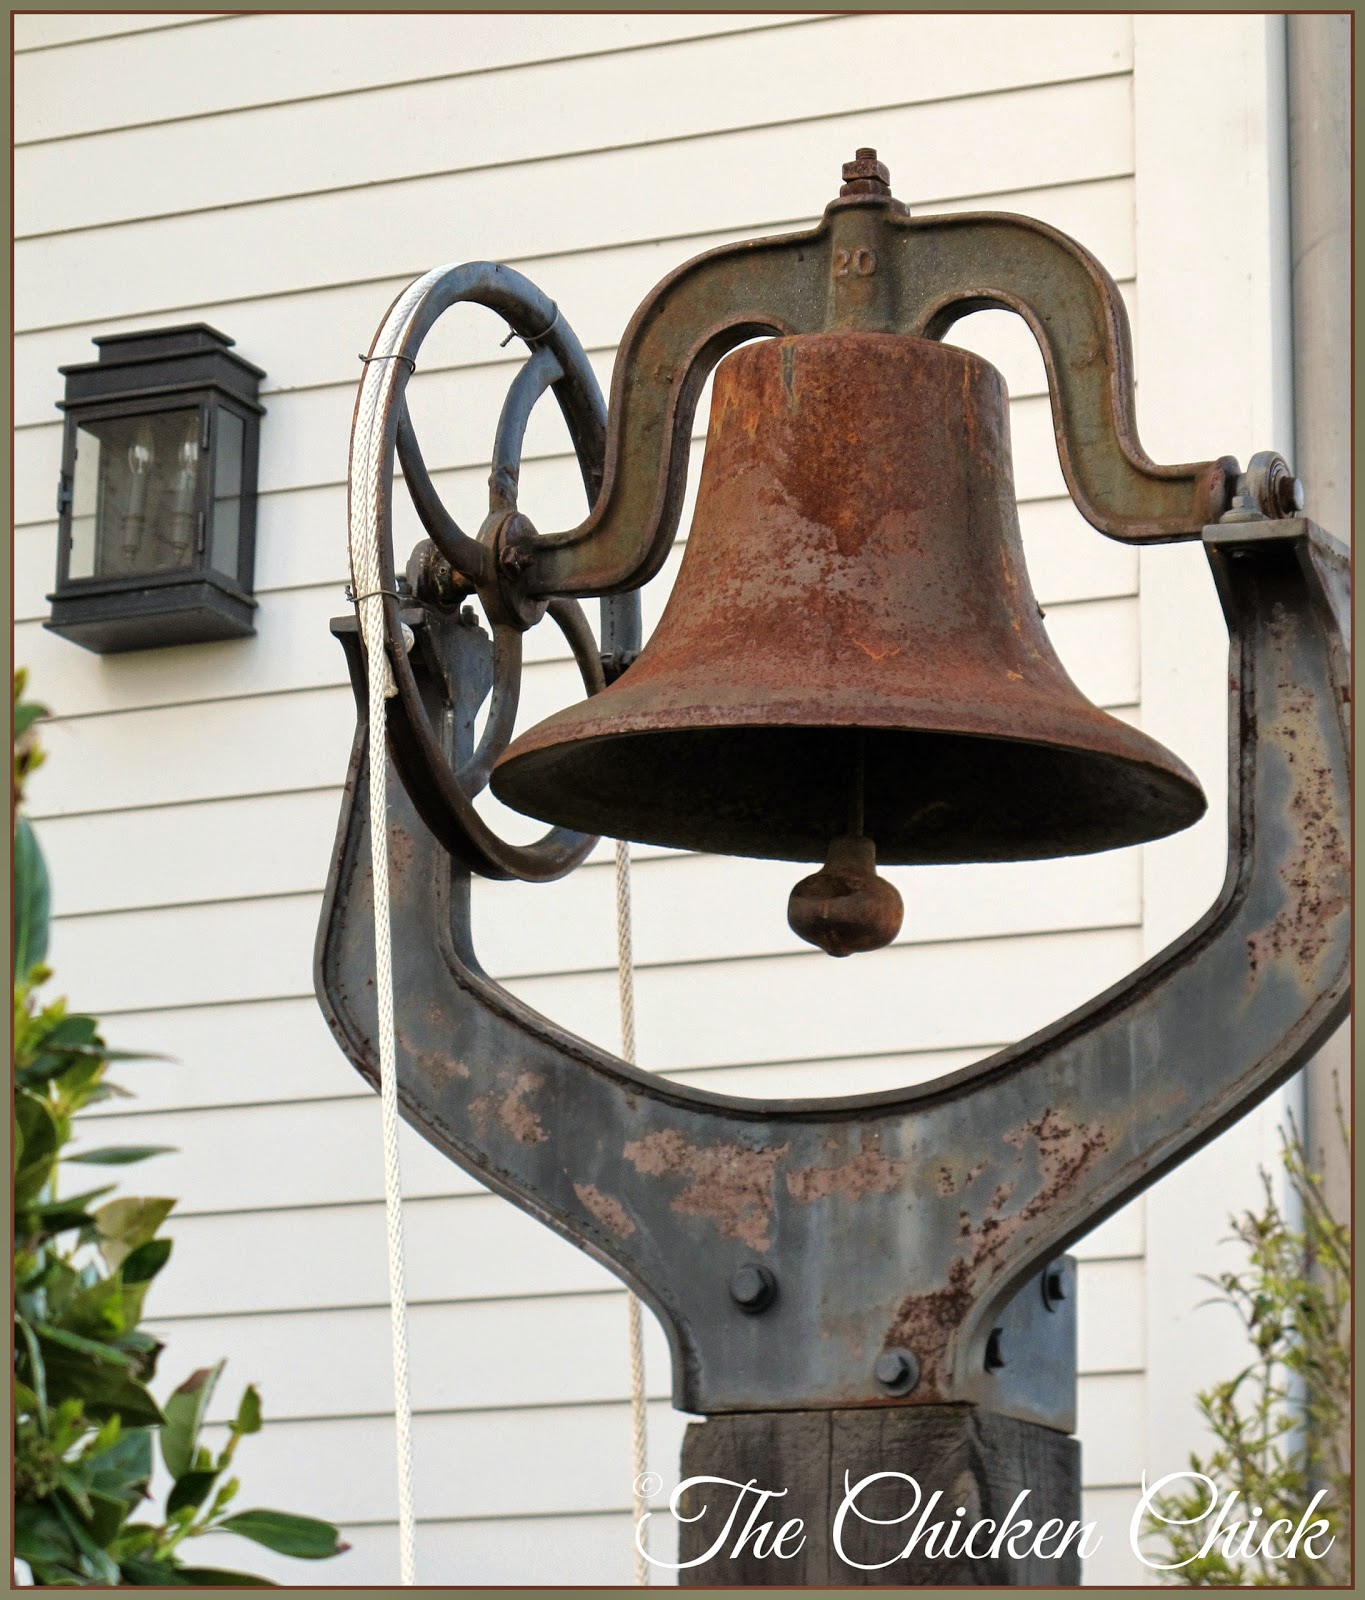 Dinner bell at the Garden Home.